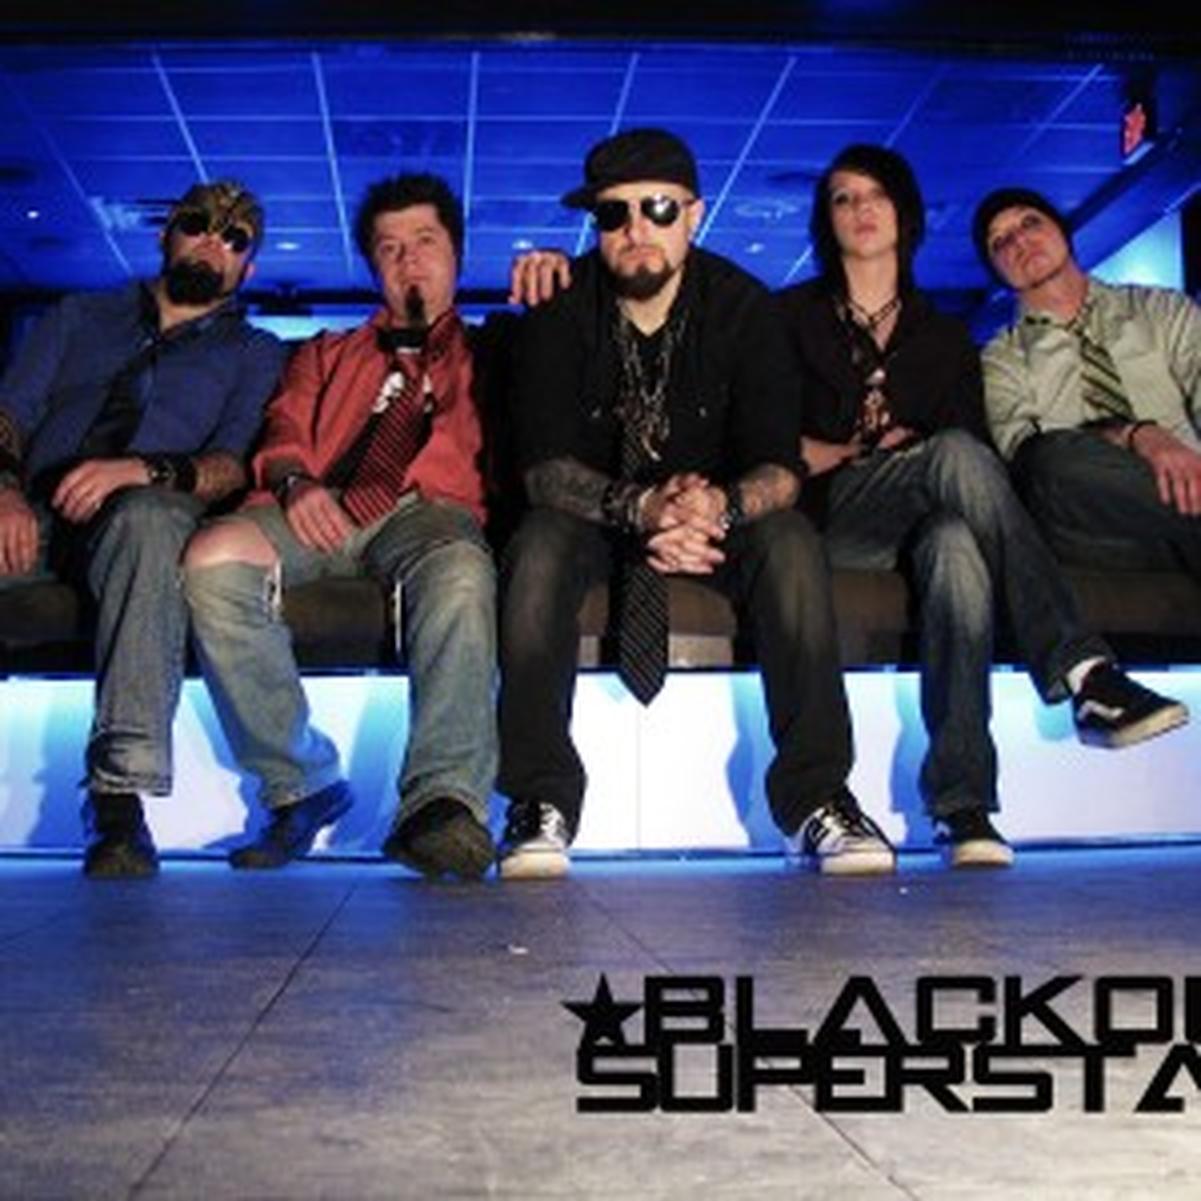 Blackout Superstar